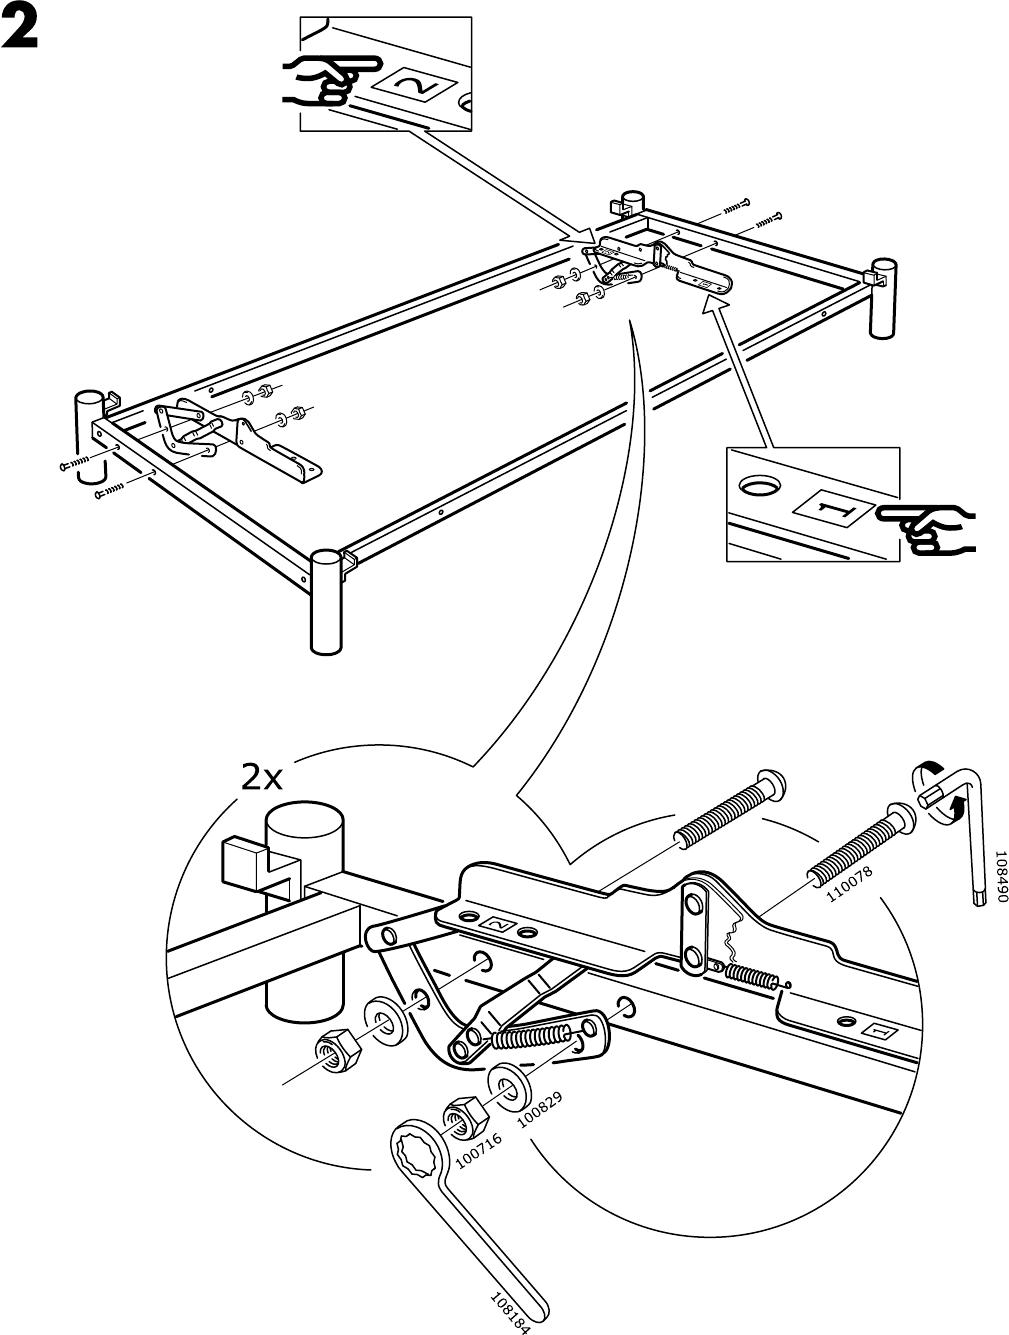 Beddinge Bedbank Ikea.Manual Ikea Beddinge Lovas Page 5 Of 8 All Languages